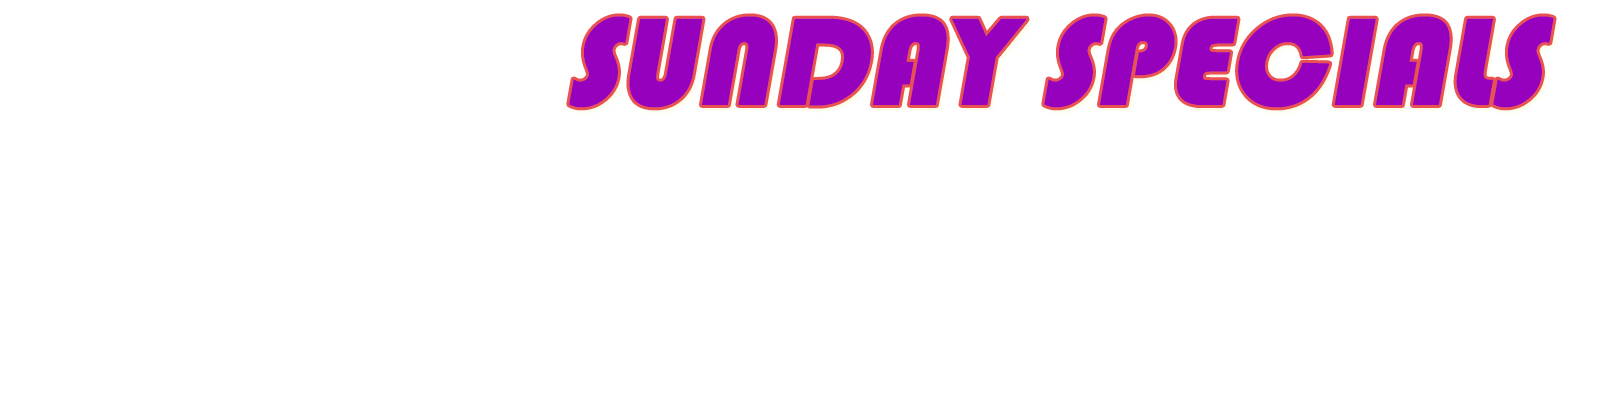 Sunday specials